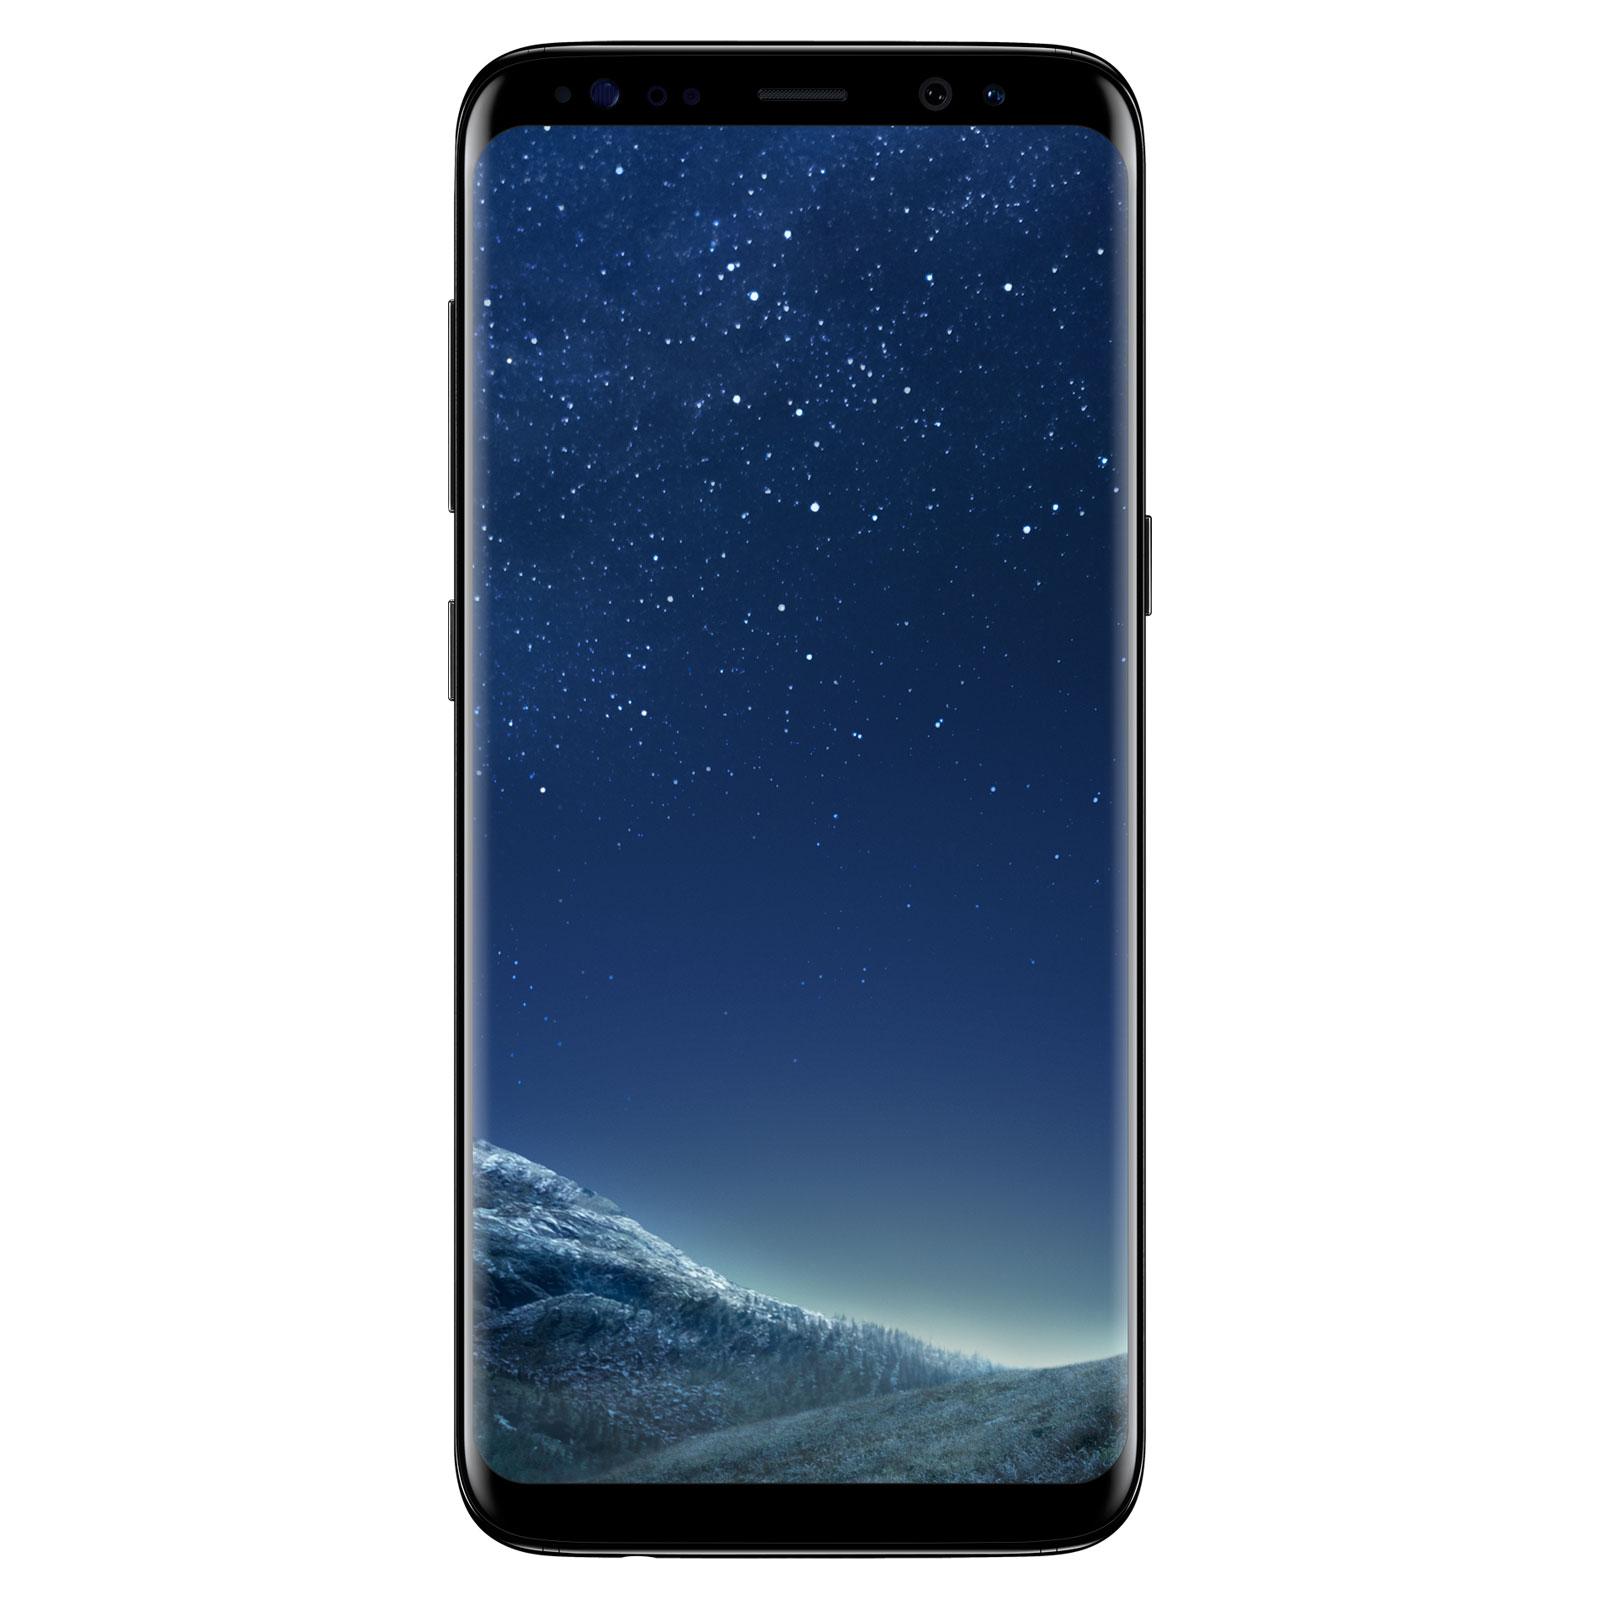 "Mobile & smartphone Samsung Galaxy S8 SM-G950F Noir Carbone 64 Go Smartphone 4G-LTE Advanced IP68 - Exynos 8895 8-Core 2.3 Ghz - RAM 4 Go - Ecran tactile 5.8"" 1440 x 2960 - 64 Go - NFC/Bluetooth 5.0 - 3000 mAh - Android 7.0"